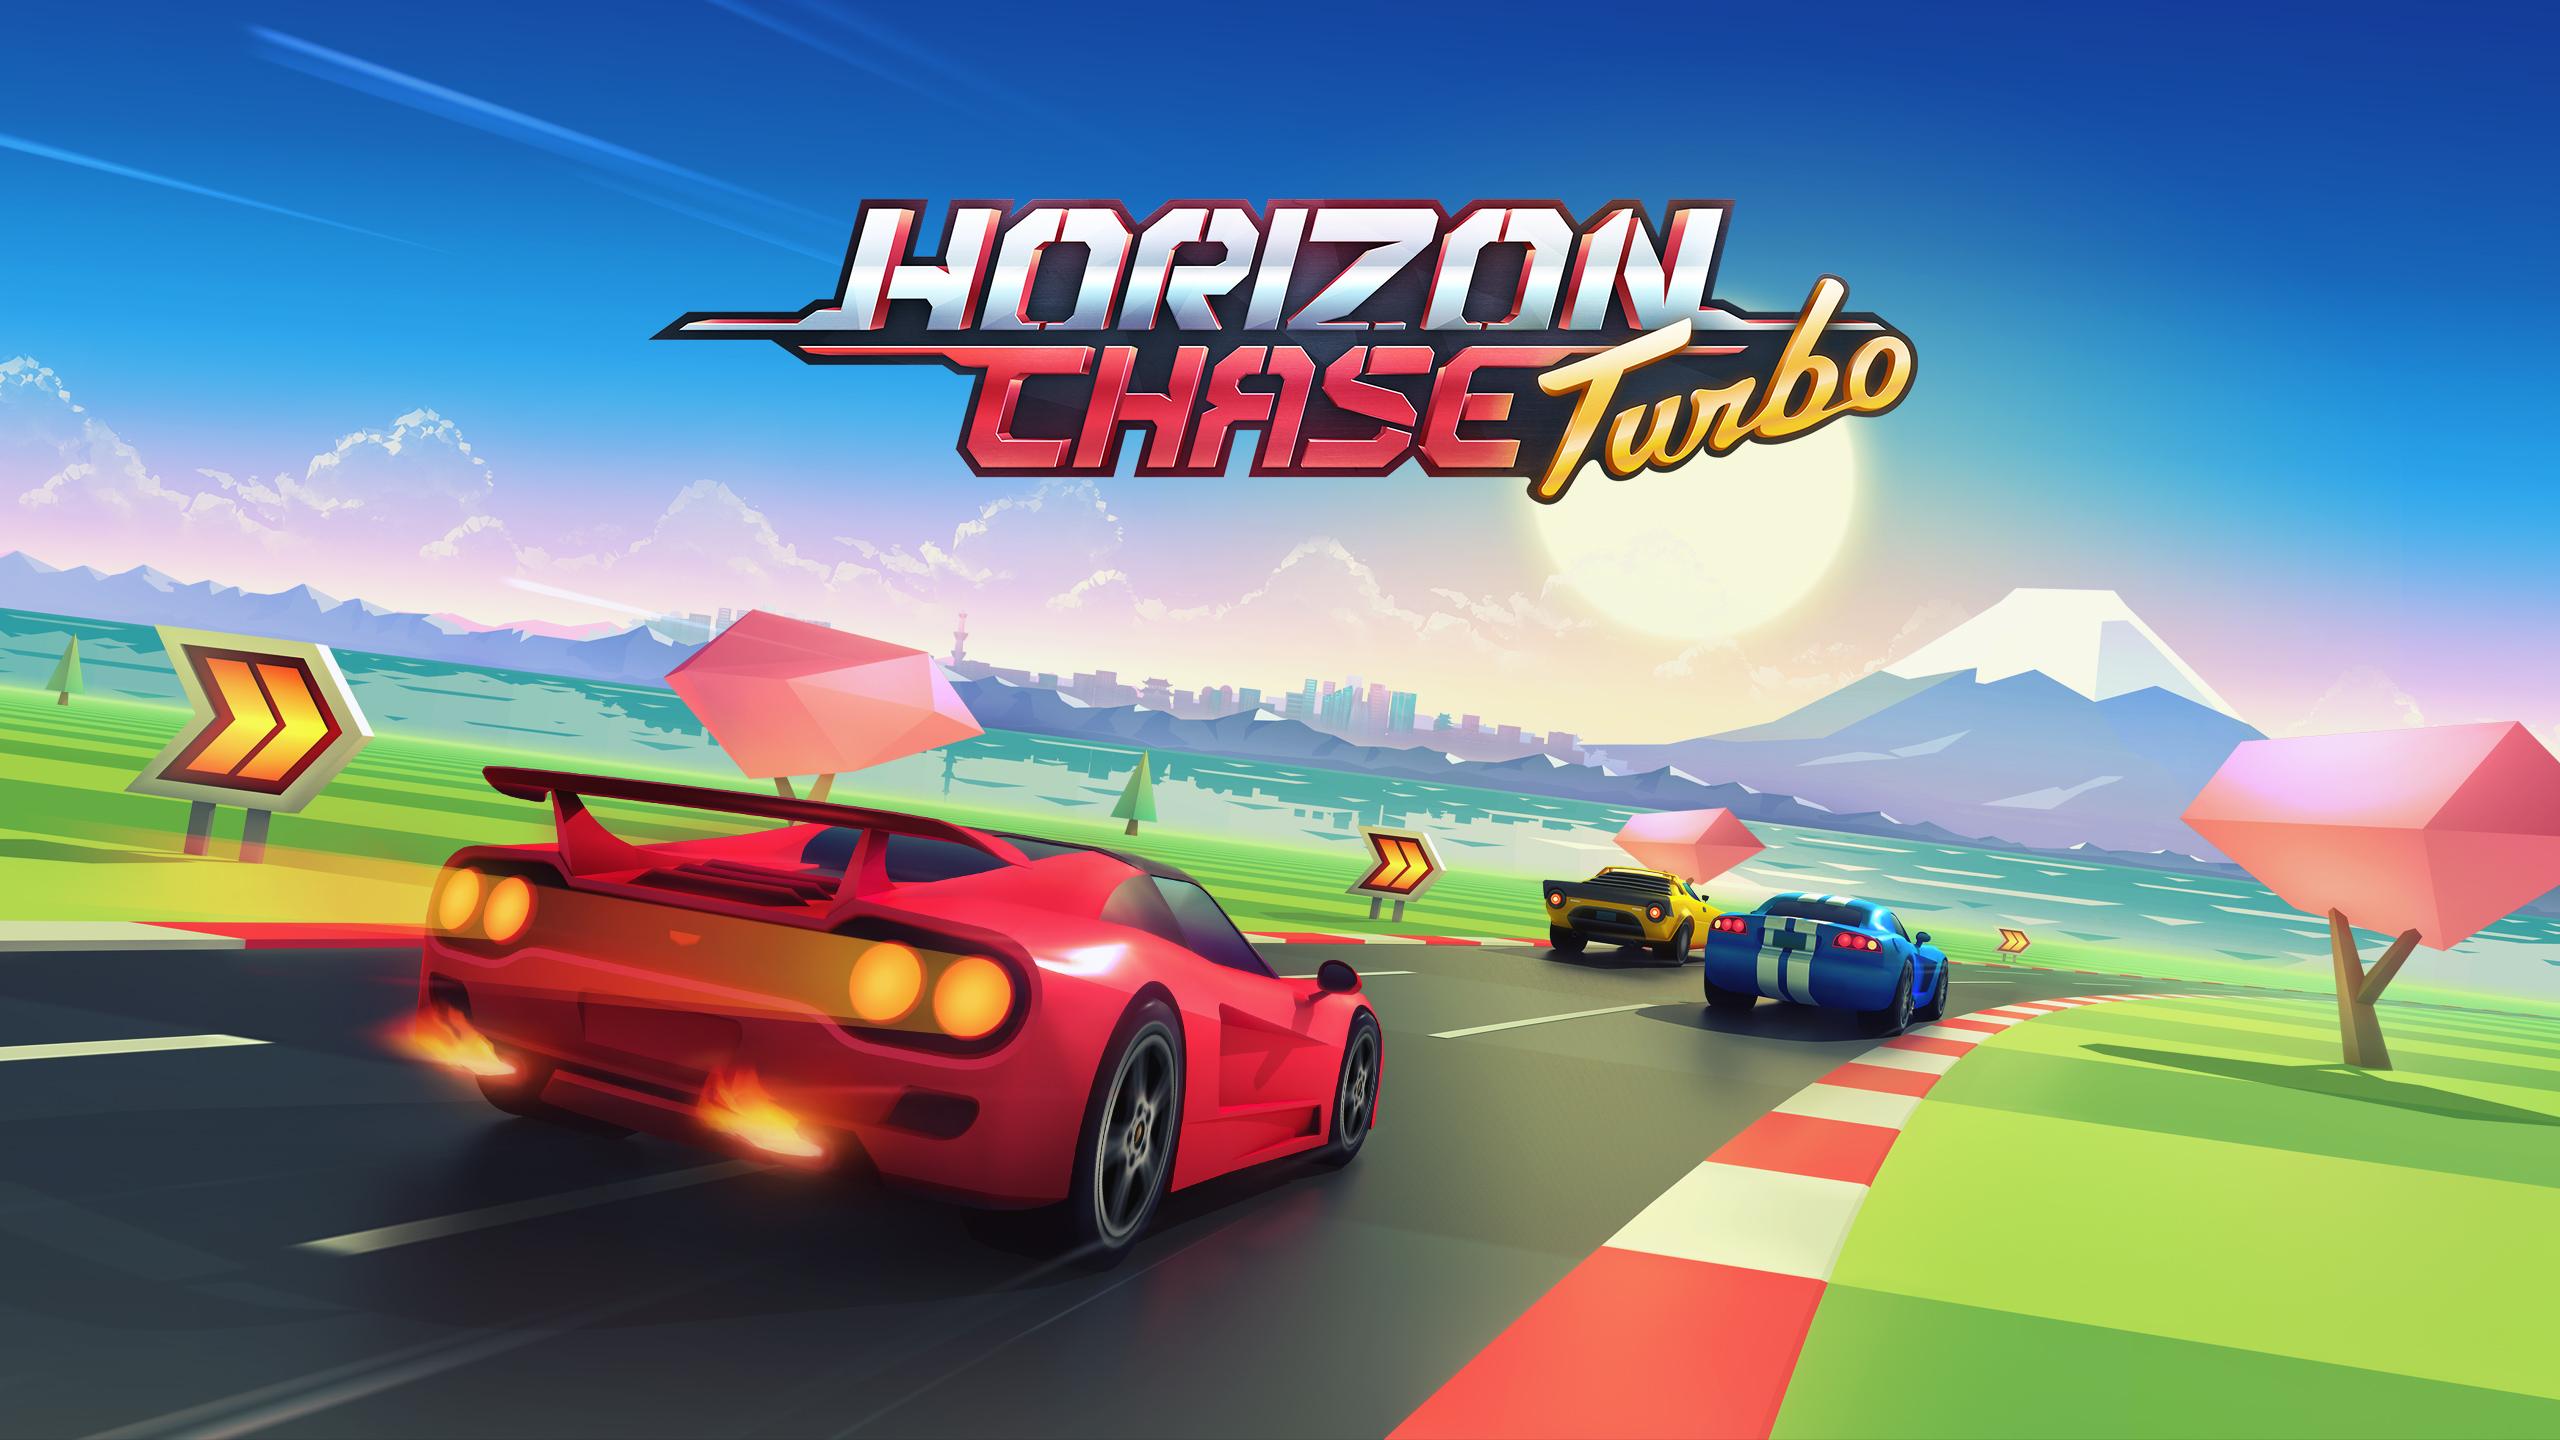 [gratis] horizon chase turbo @epic games vanaf 24 juni tot 1 juli om 17u!